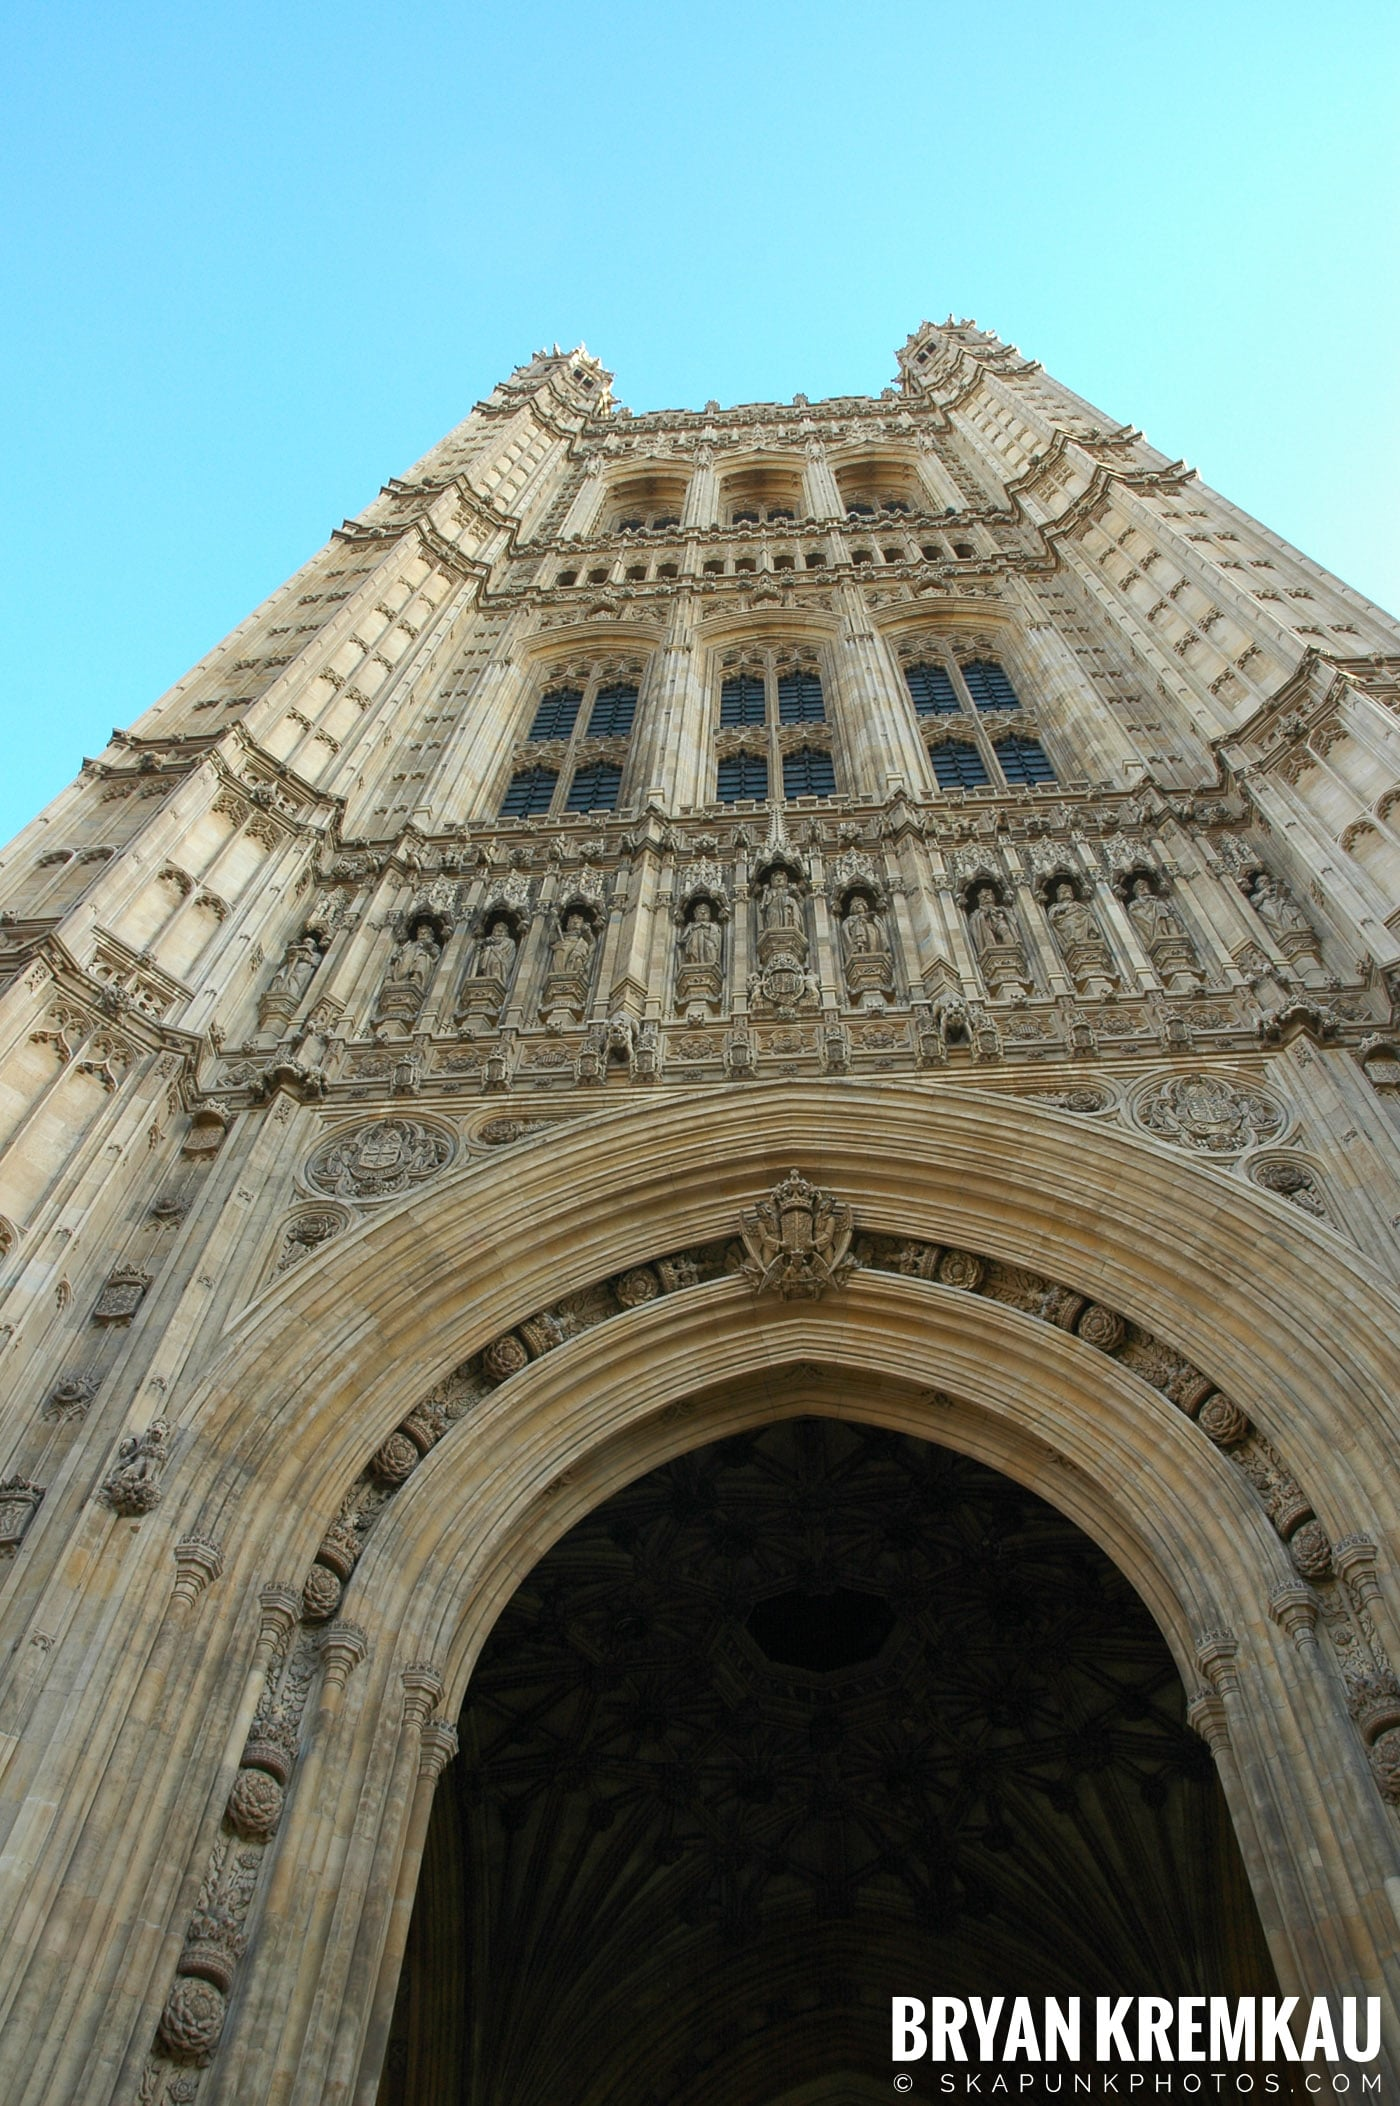 London, England - Day 4 - 12.19.05 (23)